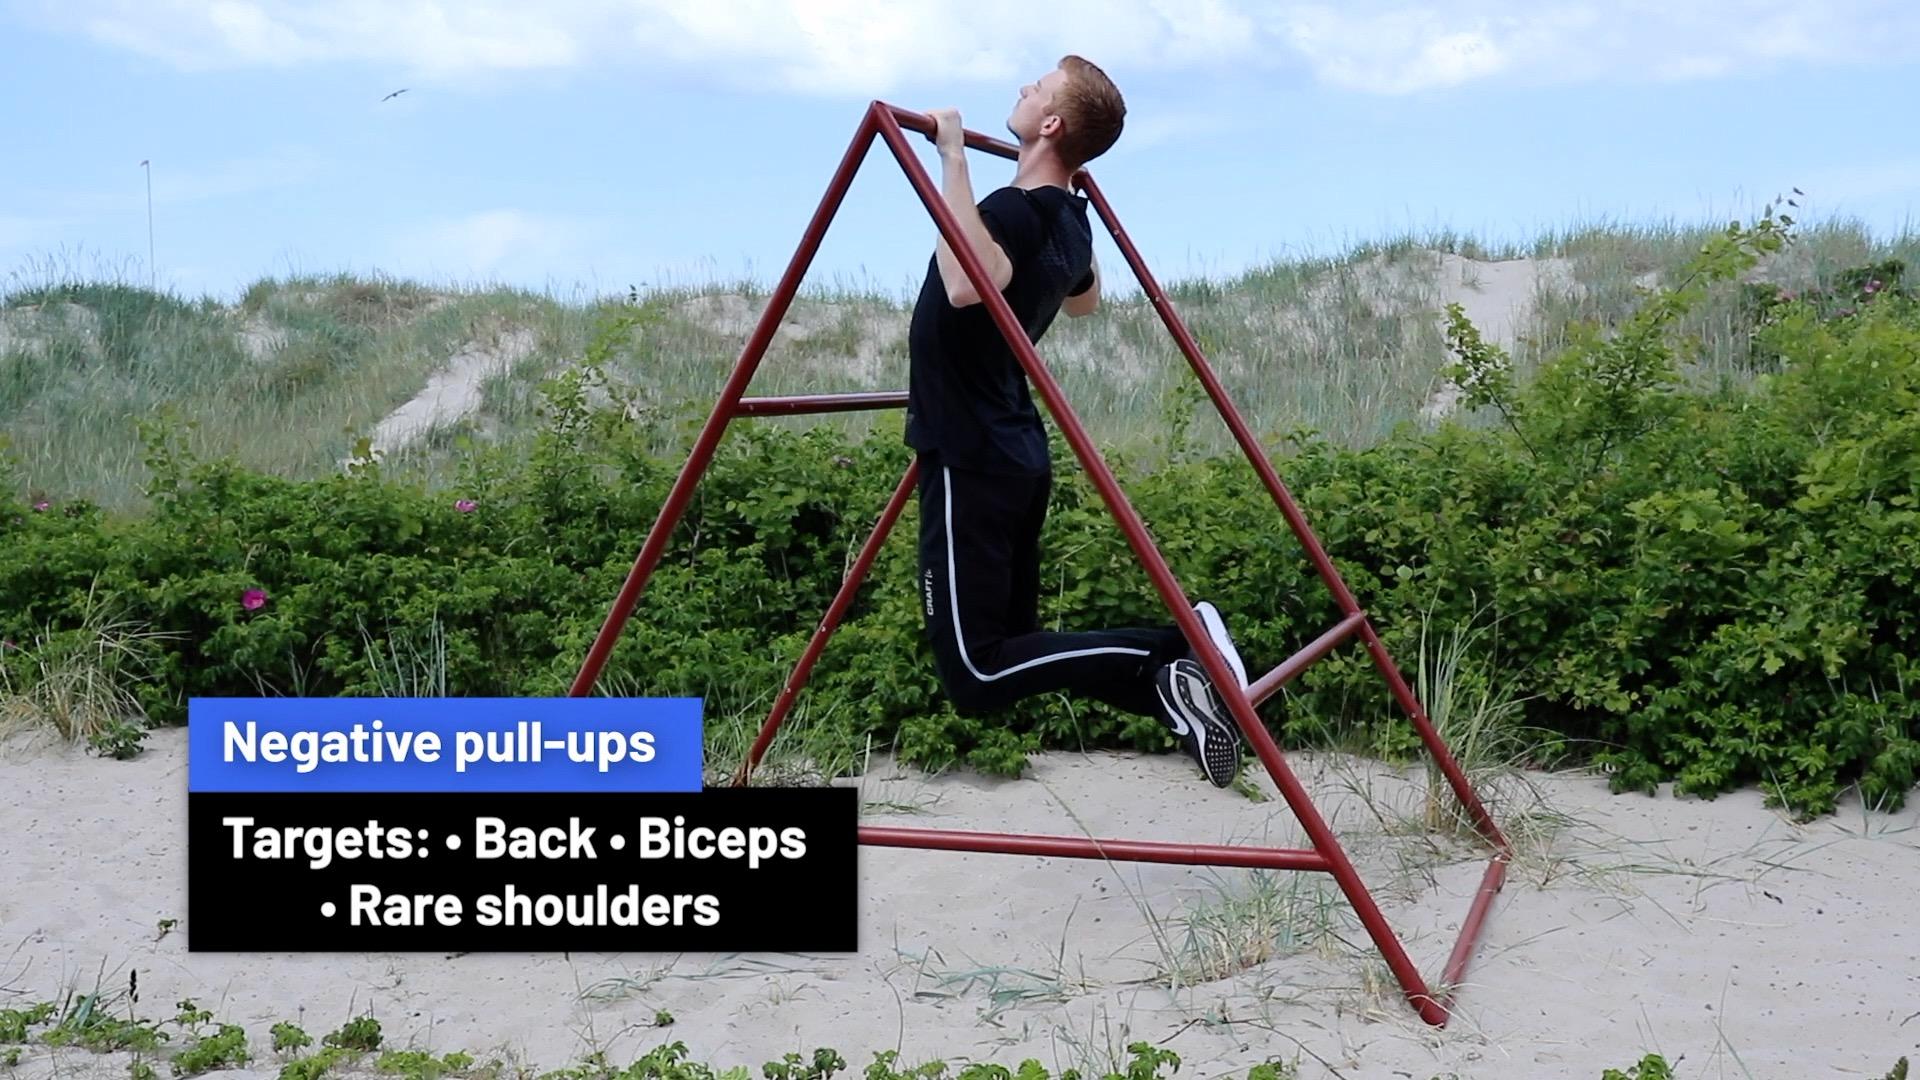 Negative pull-ups